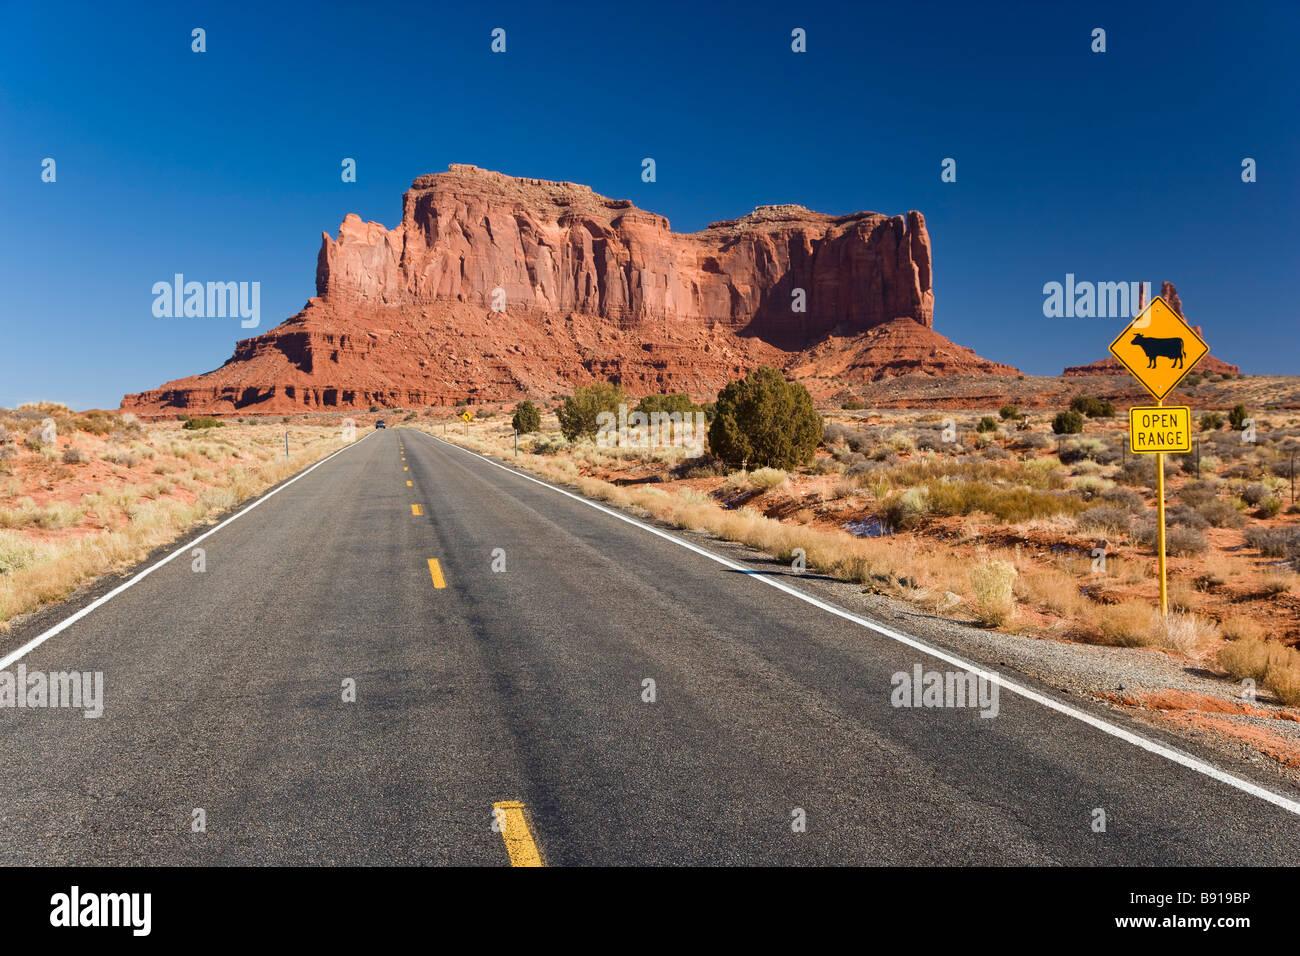 Monument Valley Arizona USA - Stock Image